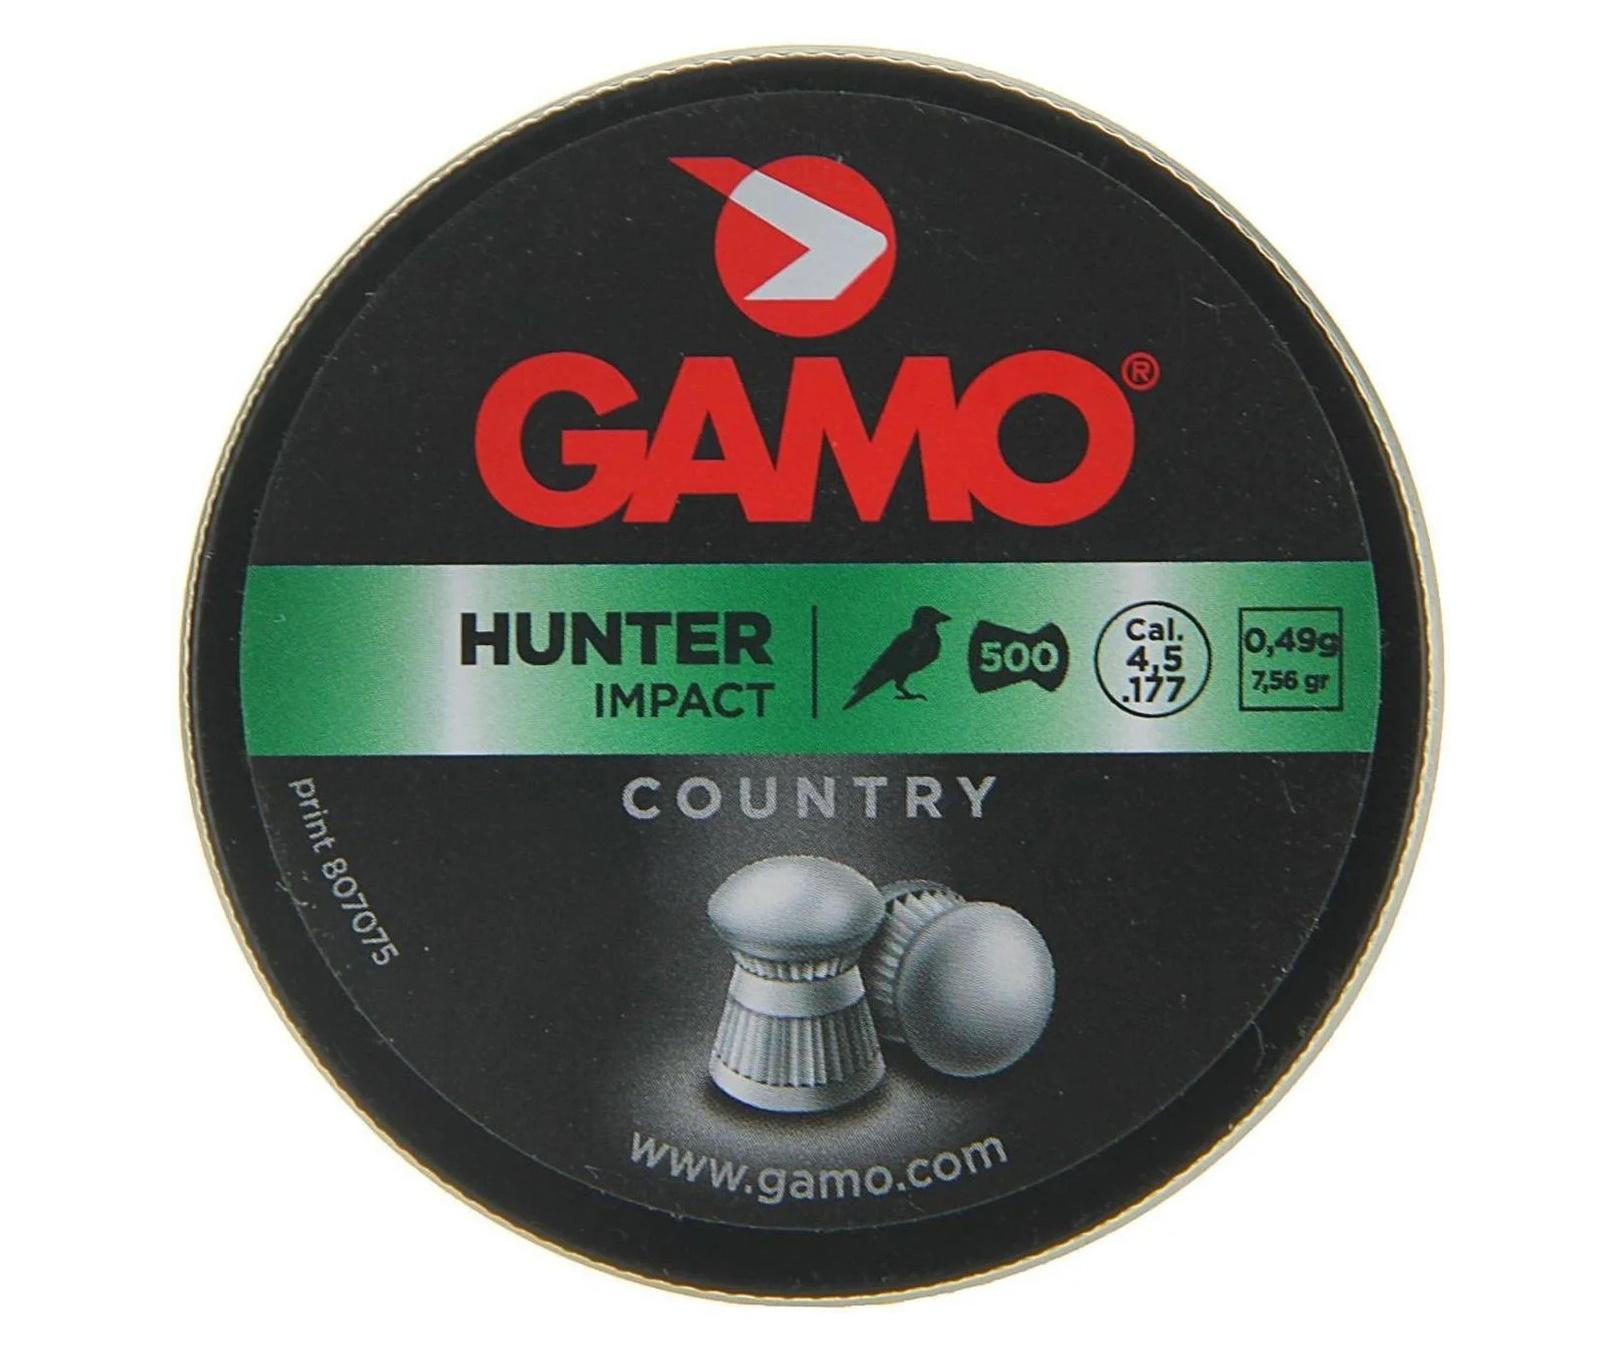 Пули Gamo Hunter 4,5 мм, 0,49 грамм, 500 штук